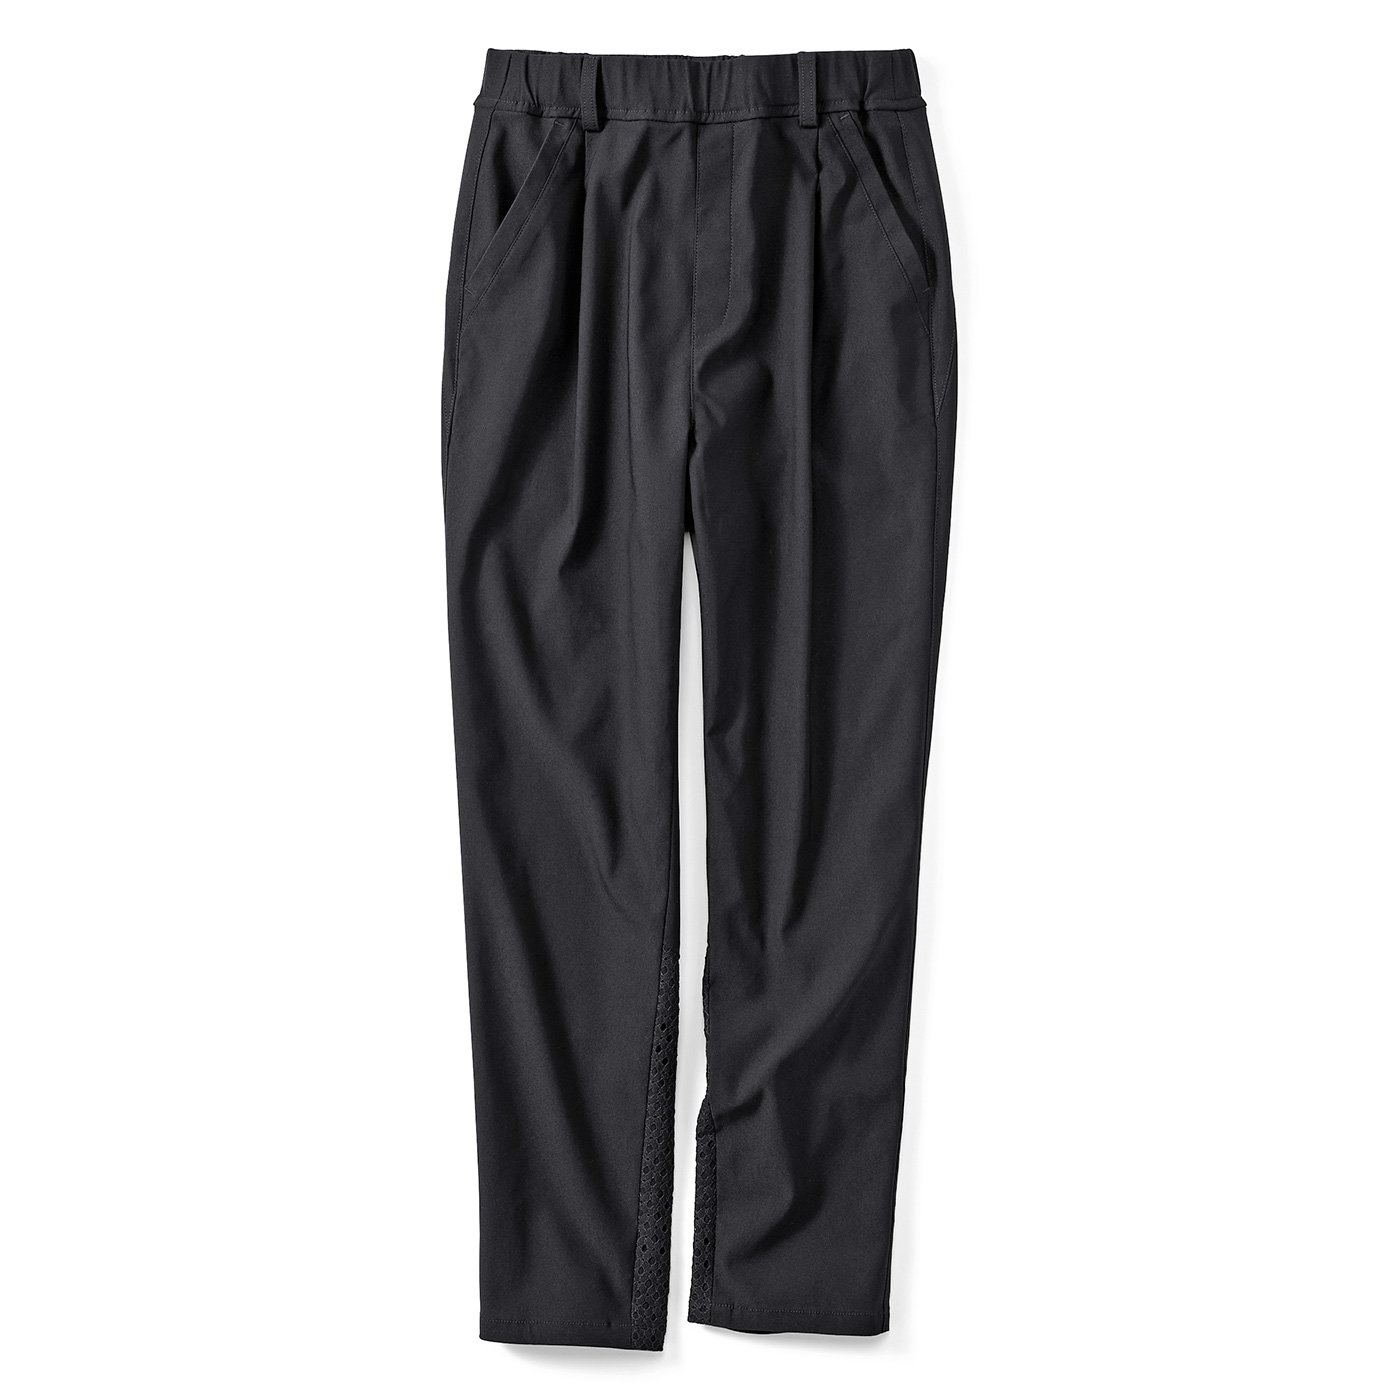 IEDIT[イディット] 歩くたびに空気が通る涼やかパンツ 美脚テーパード〈ブラック〉